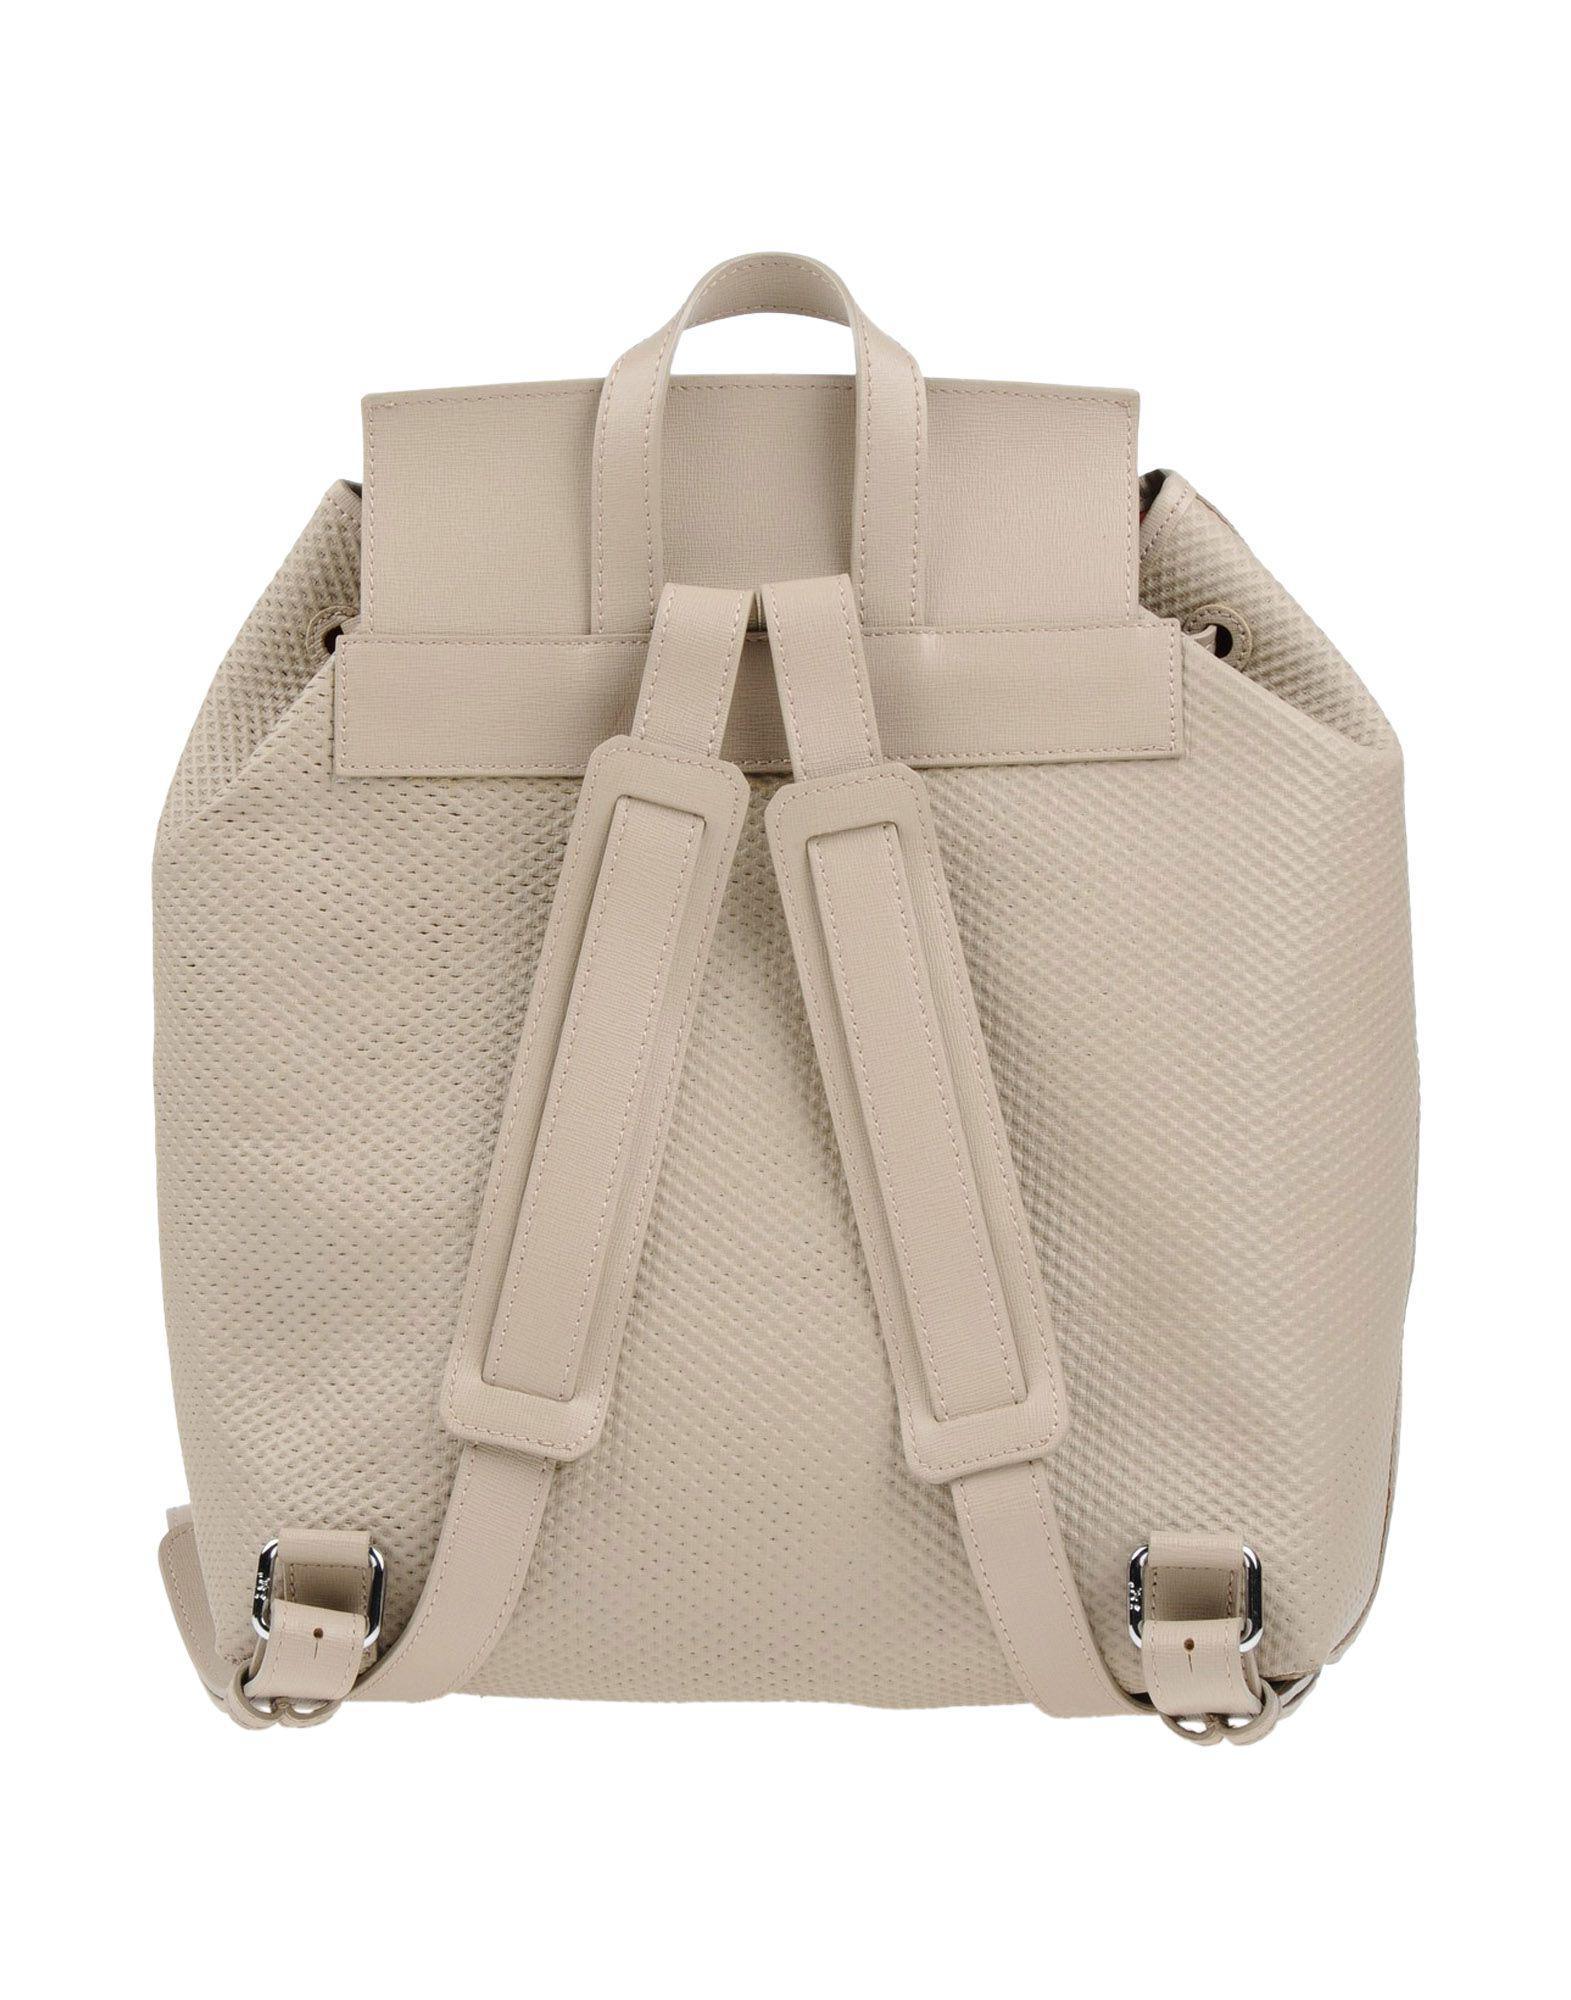 J&C JACKYCELINE Leather Backpacks & Fanny Packs in Light Grey (Grey)